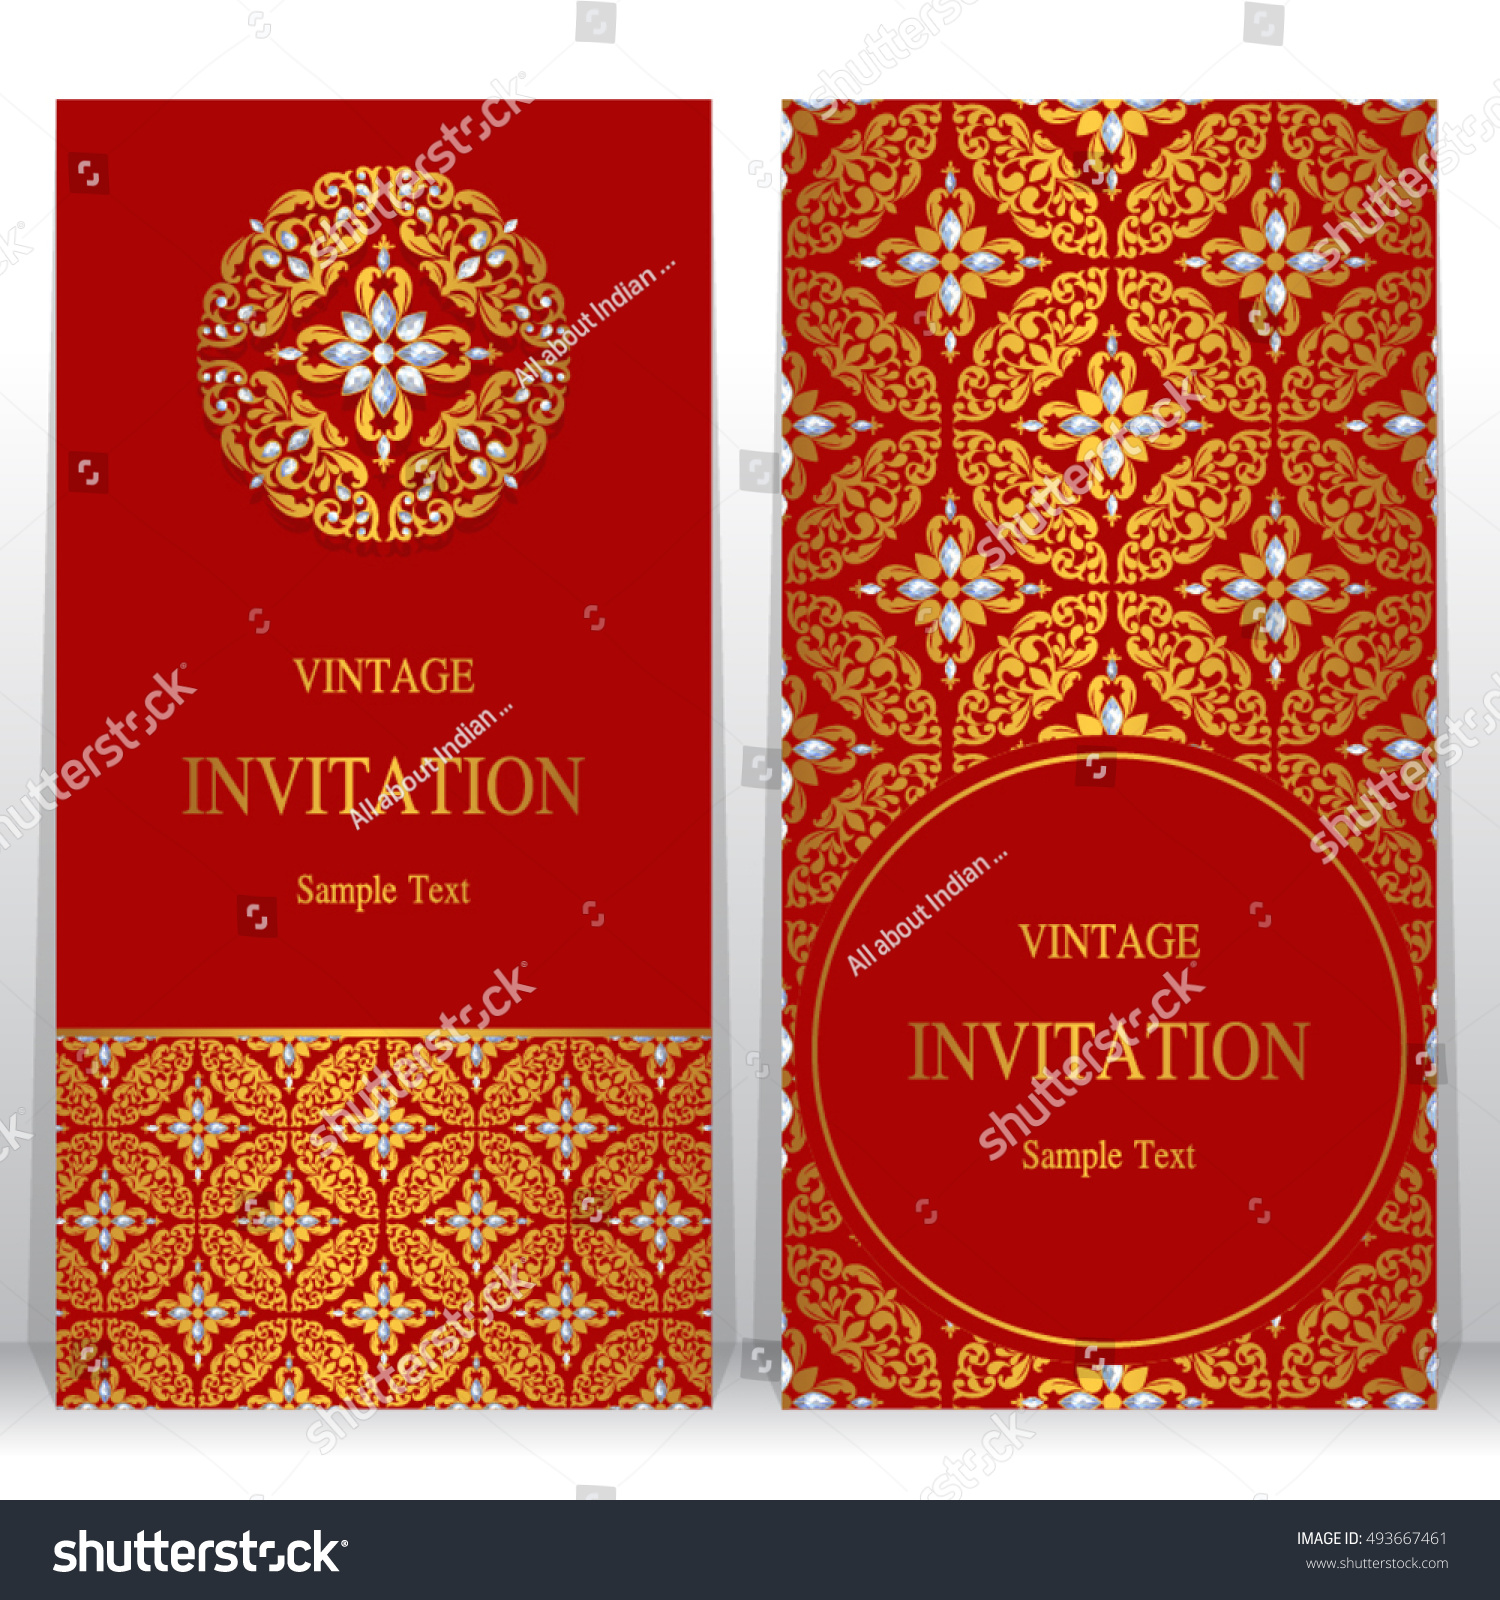 Wedding Invitation Card Abstract Background Islam Stock Vector HD ...